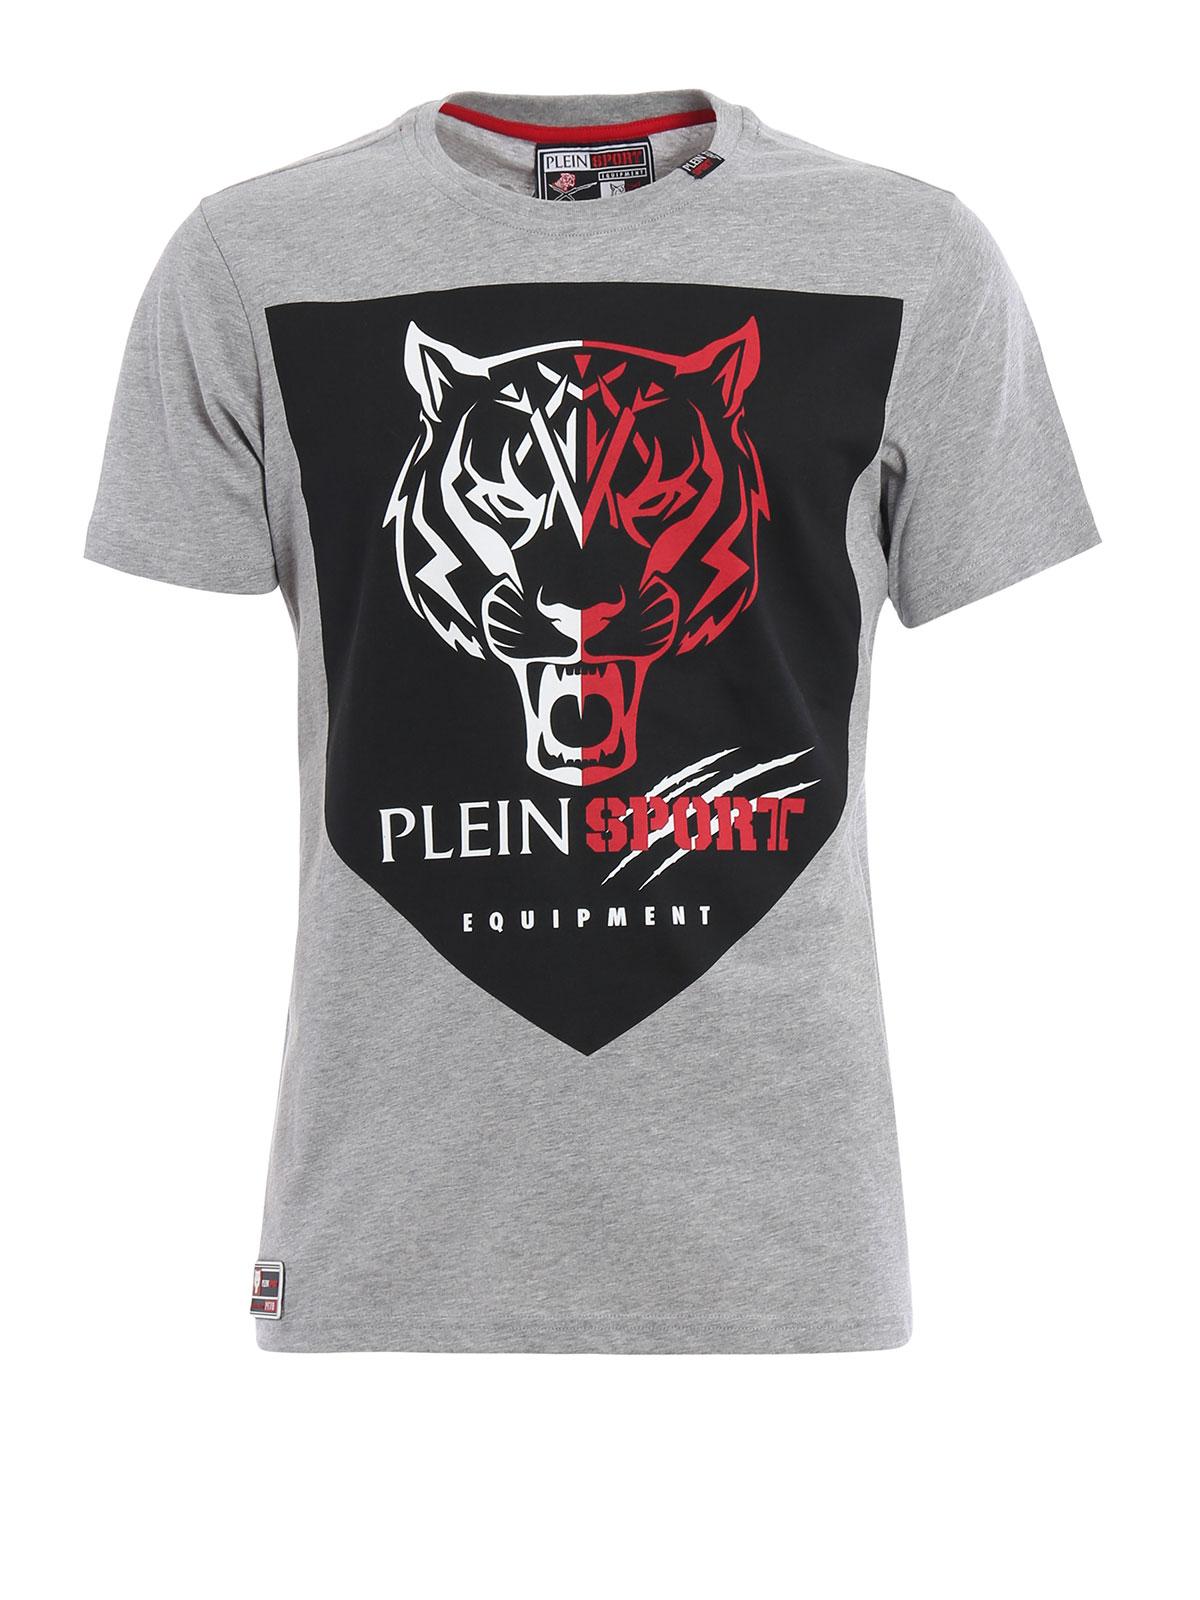 Philip Plein T Shirts. philipp plein perfect world t shirt in black ... 5d4bb619202